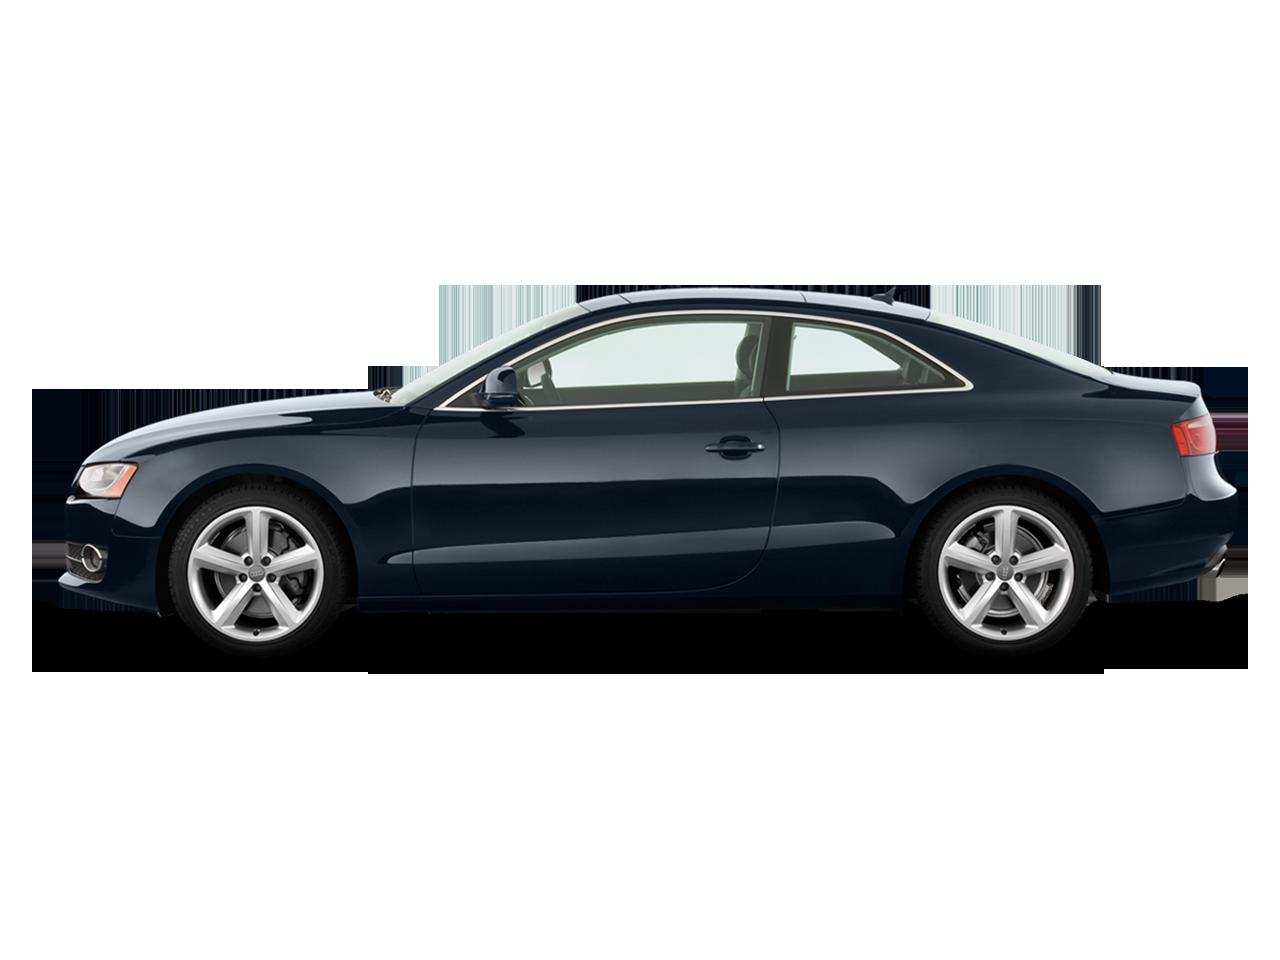 2010 audi a5 and s5 cabriolet audi sport convertible automobile magazine. Black Bedroom Furniture Sets. Home Design Ideas